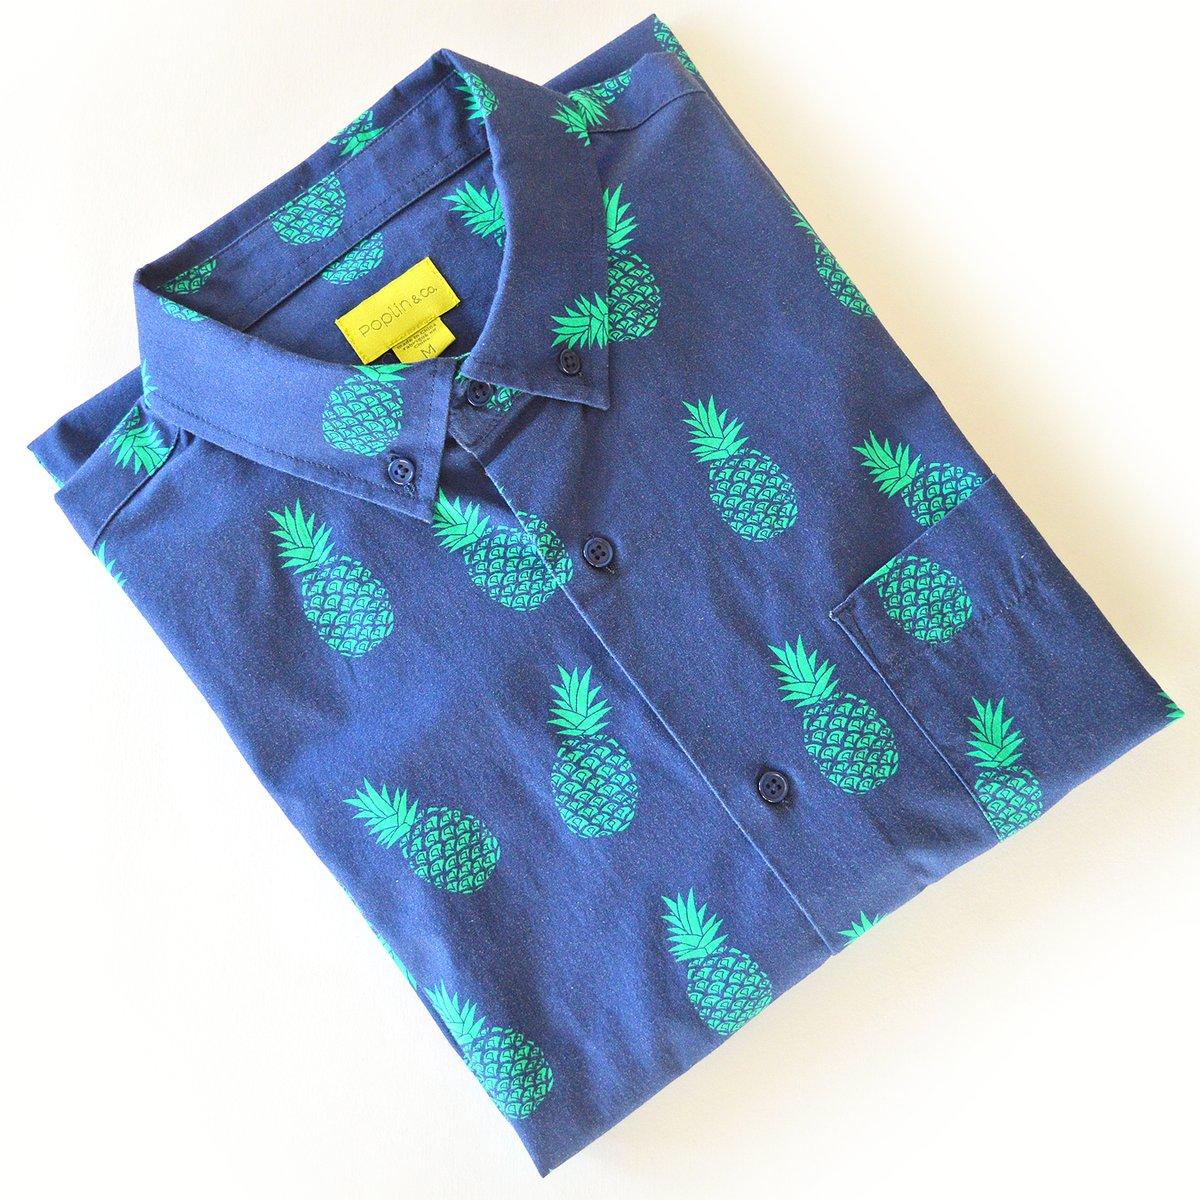 Pineapple Party Short Sleeve Shirt. #pineapple #pineapple#pineappleshirt #pineappleprint #spring2020 #spring2020fashion #springcollection #springcollection2020 #vintageshirts #floralshirts #floralpattern #extrovertedshirts #extrovertedintrovertspic.twitter.com/oiUa2EuwI4